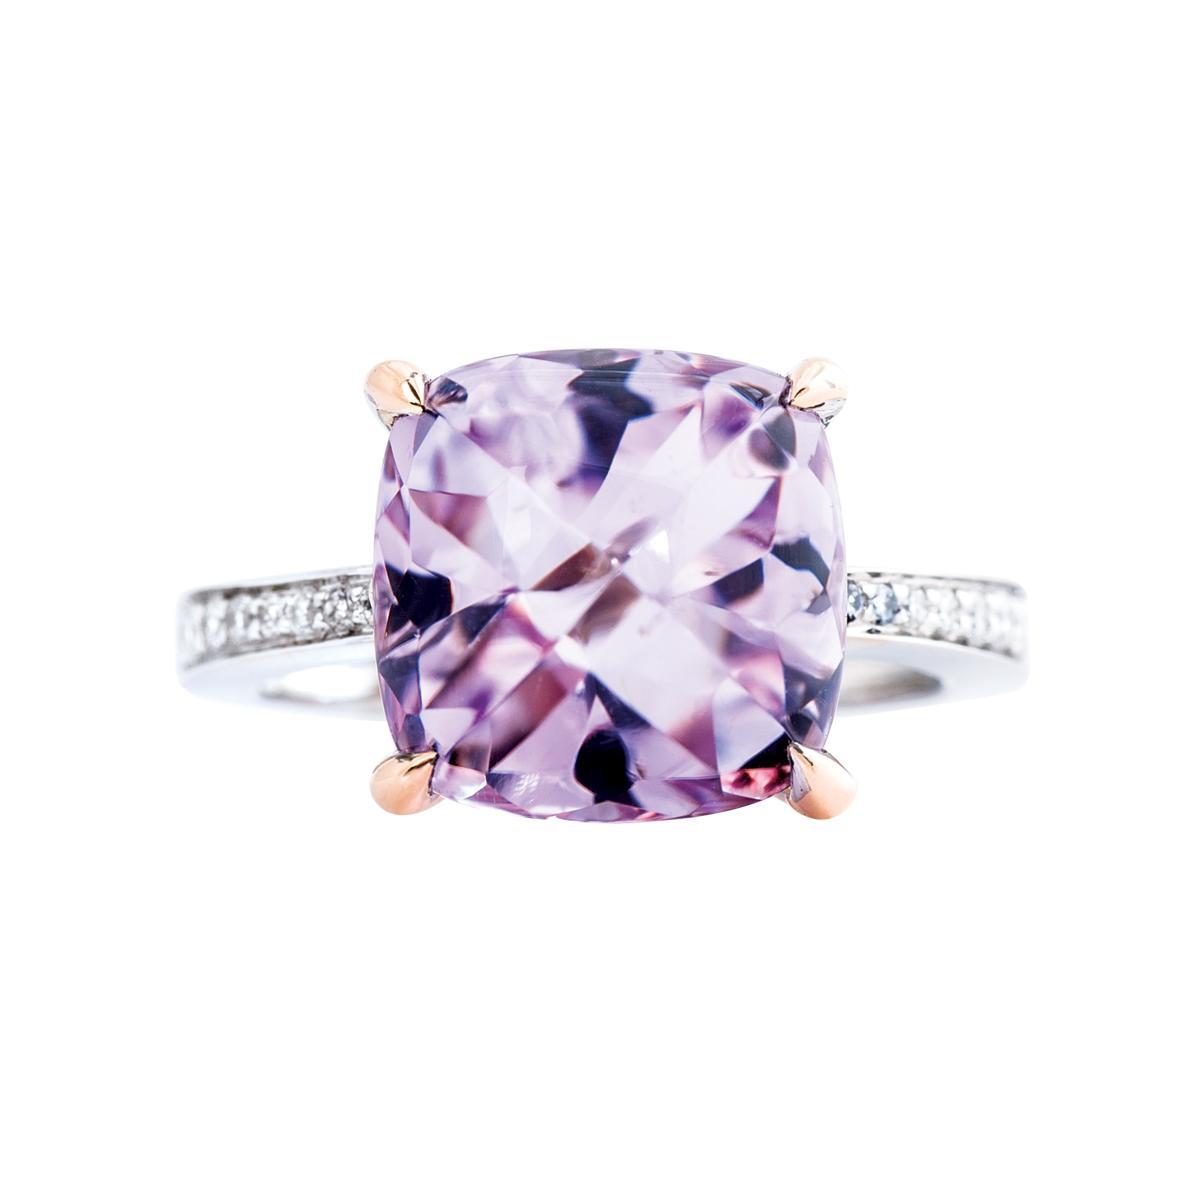 Vintage Frederic Sage 9.47 CT Rose Quartz Ring